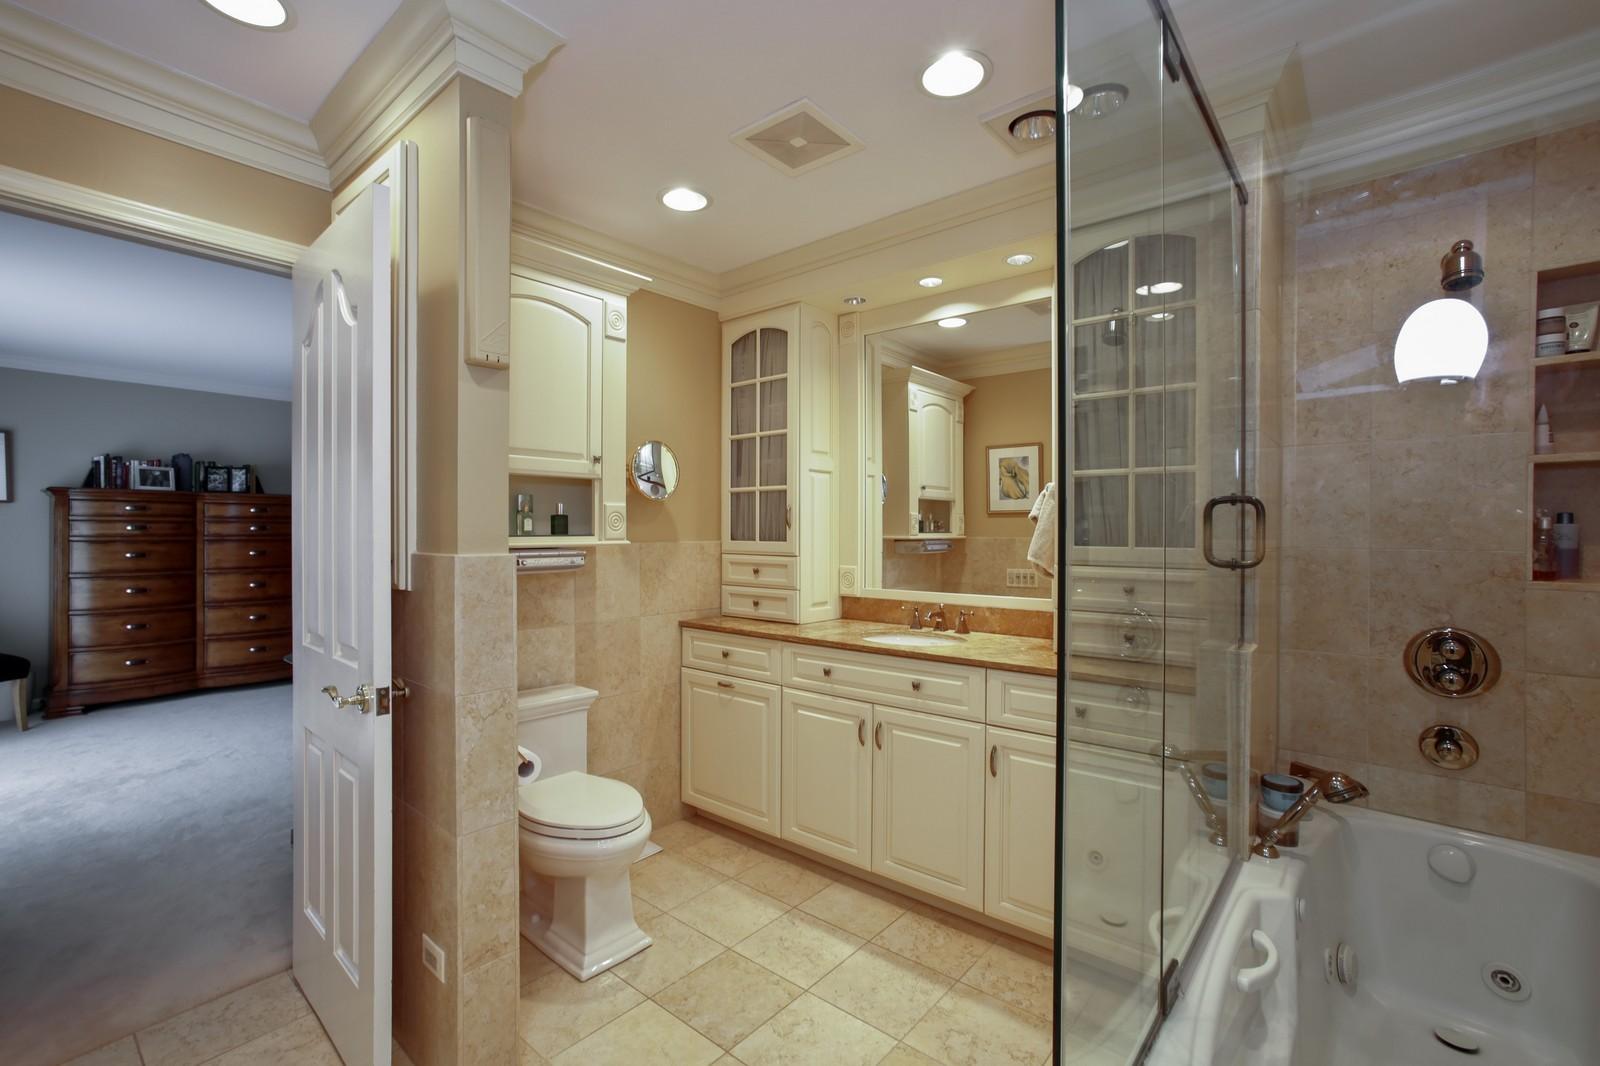 Real Estate Photography - 25W445 Plamondon Rd, Wheaton, IL, 60189 - Master Bath - Hers